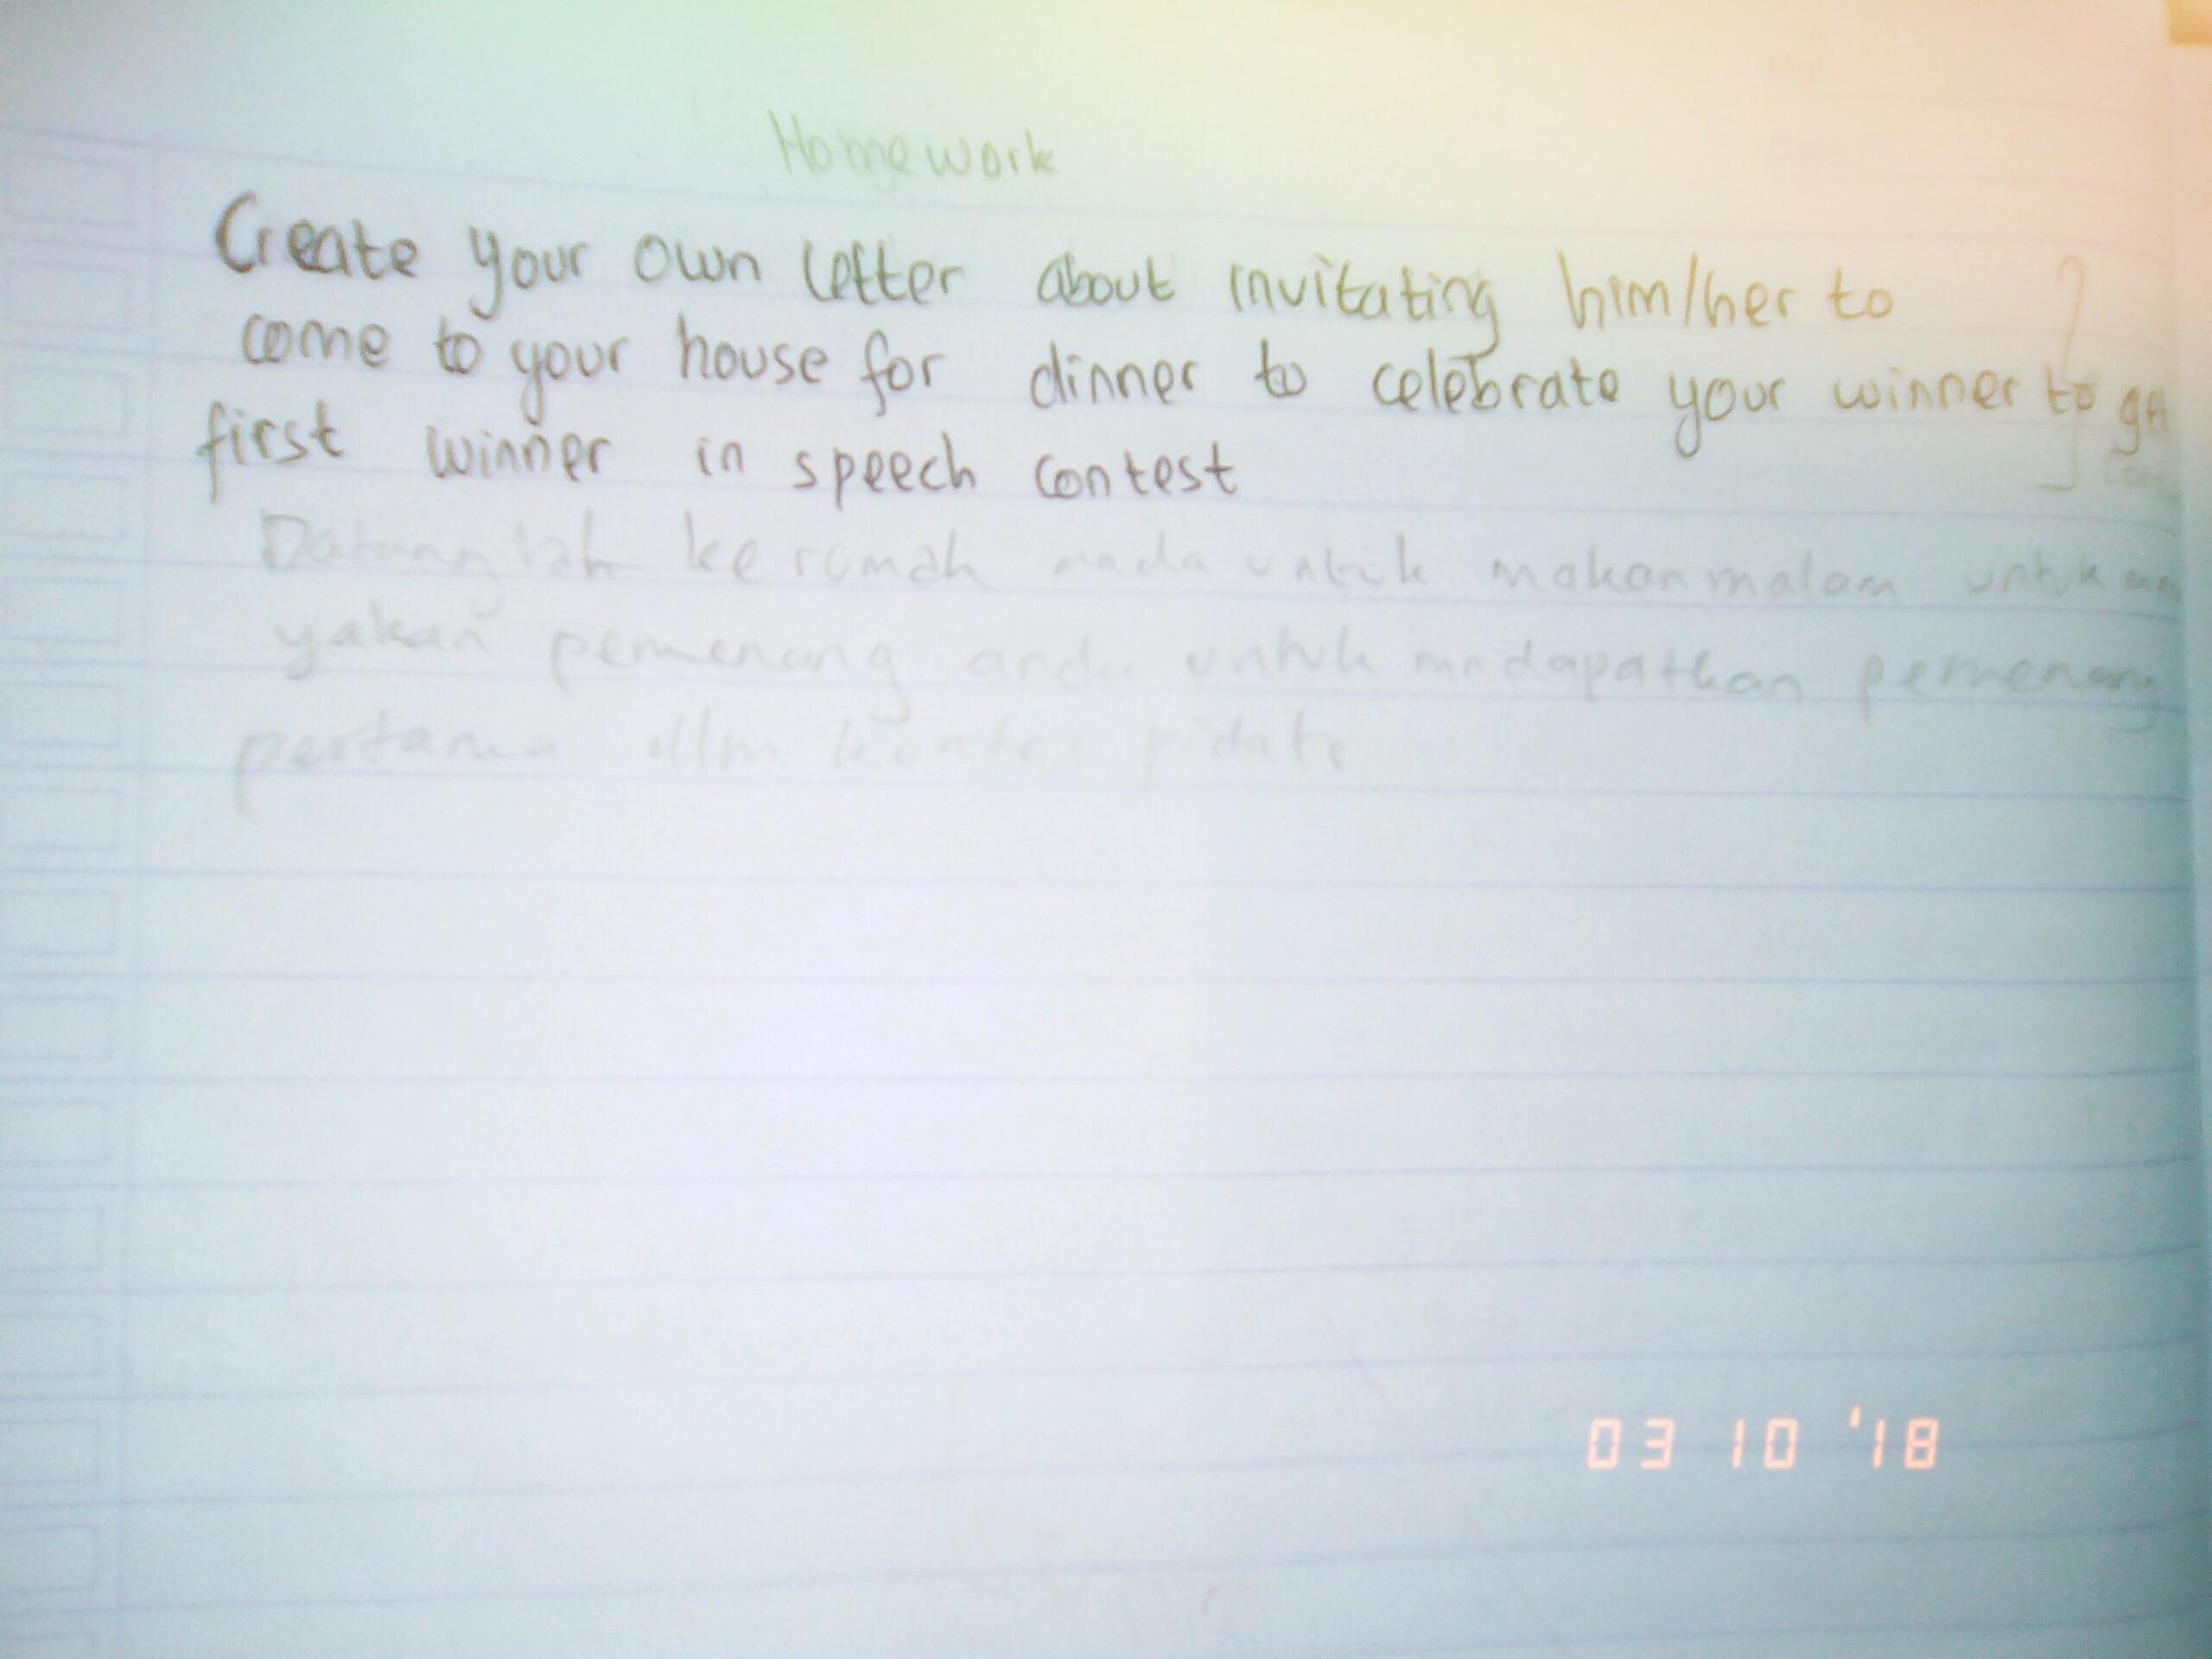 Surat Pribadi Dalam Bhs Inggris Brainlycoid